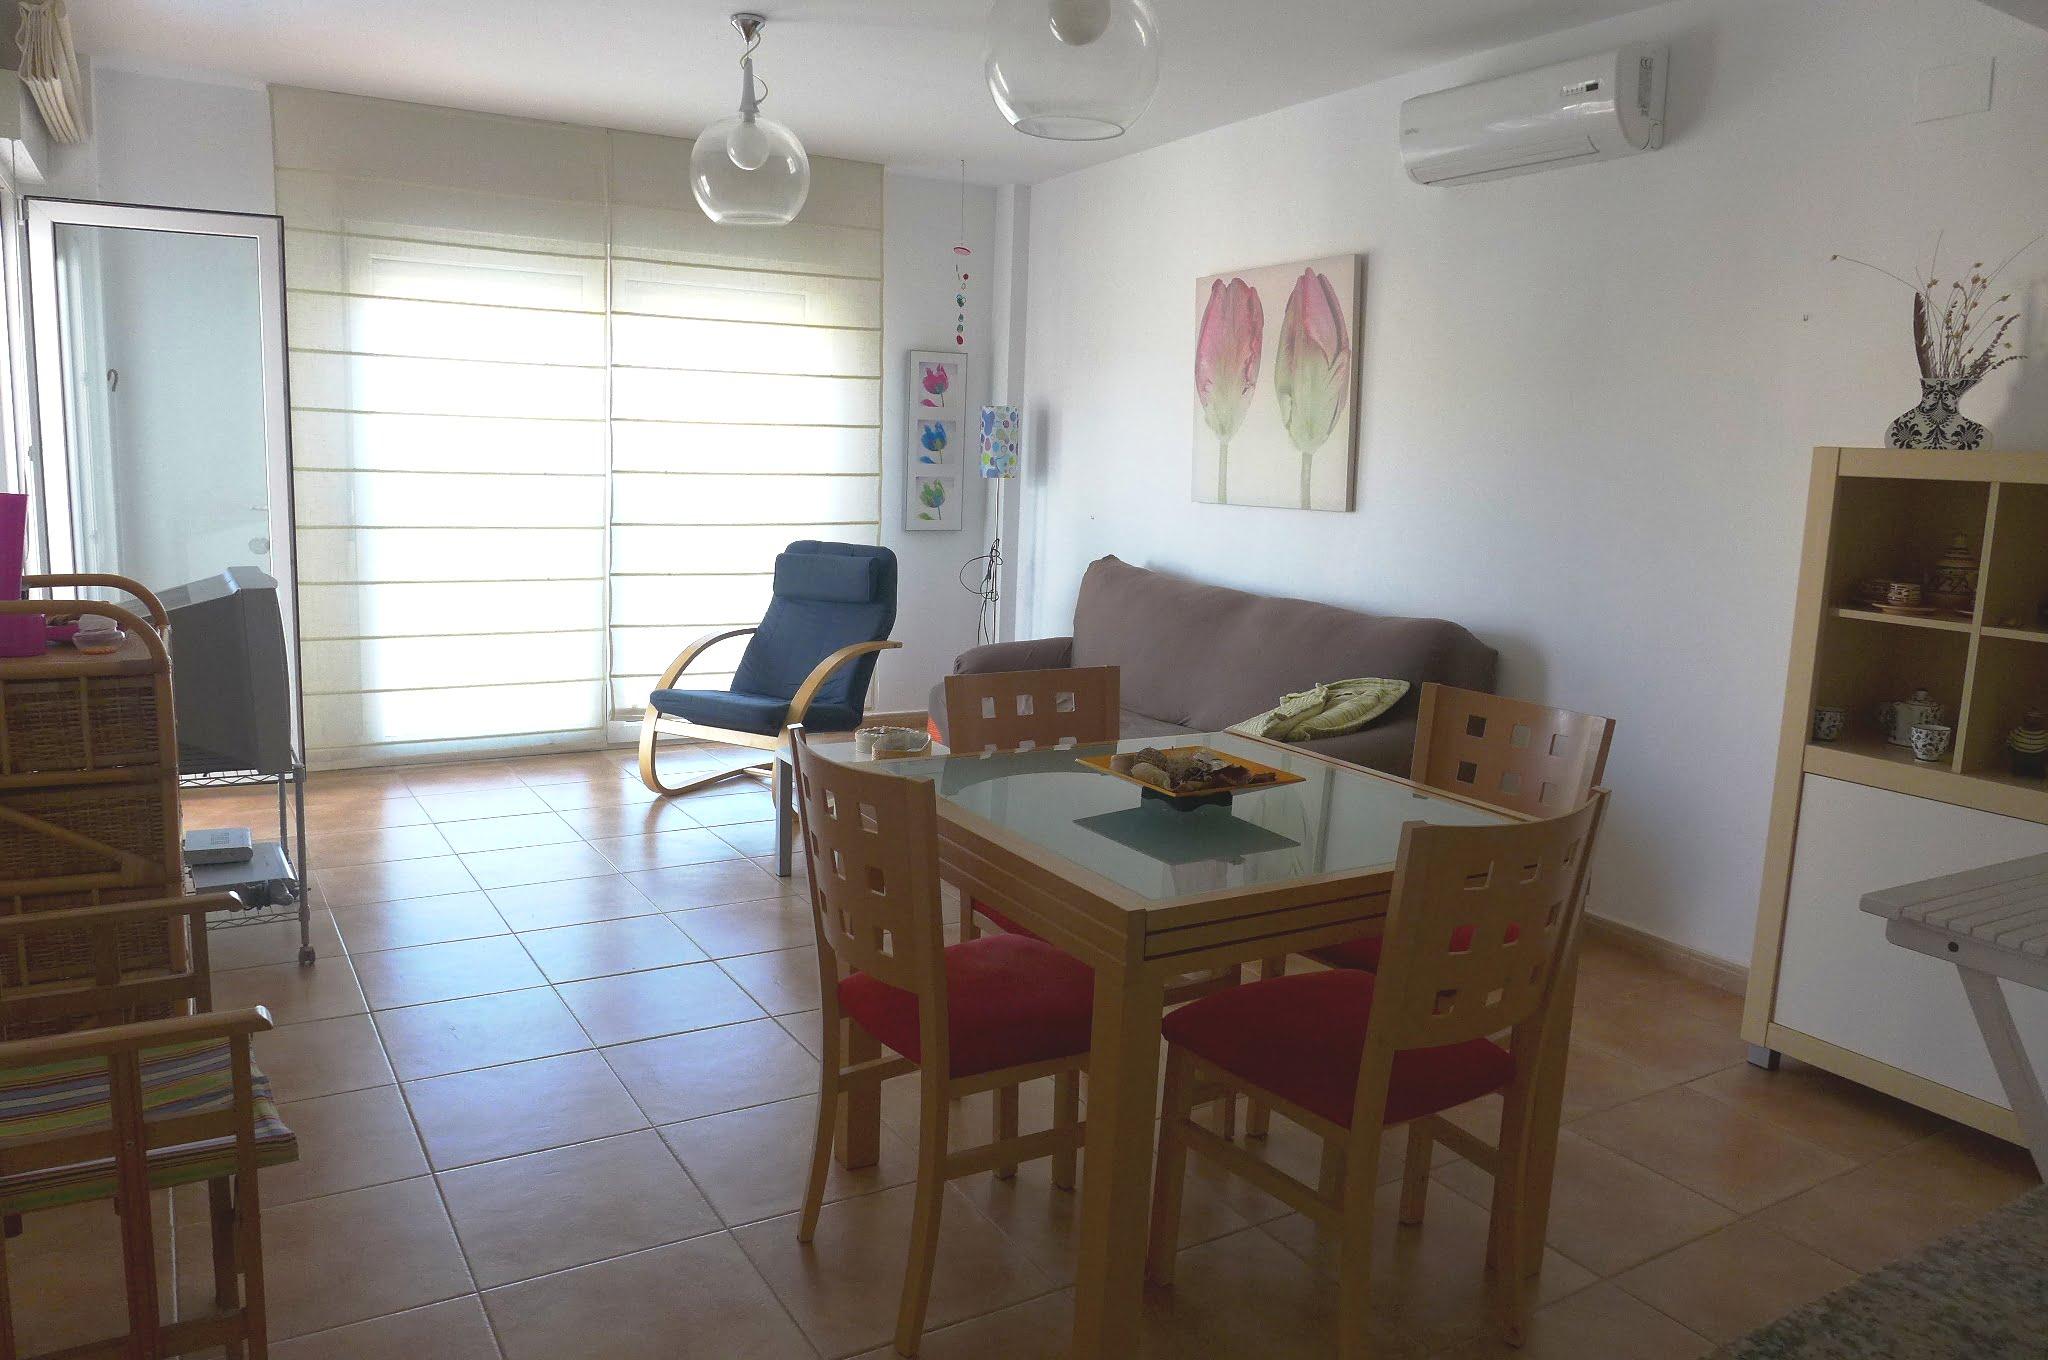 Alquiler apartamento en oliva 450 euros al mes d - Alquiler de apartamentos en oliva playa ...